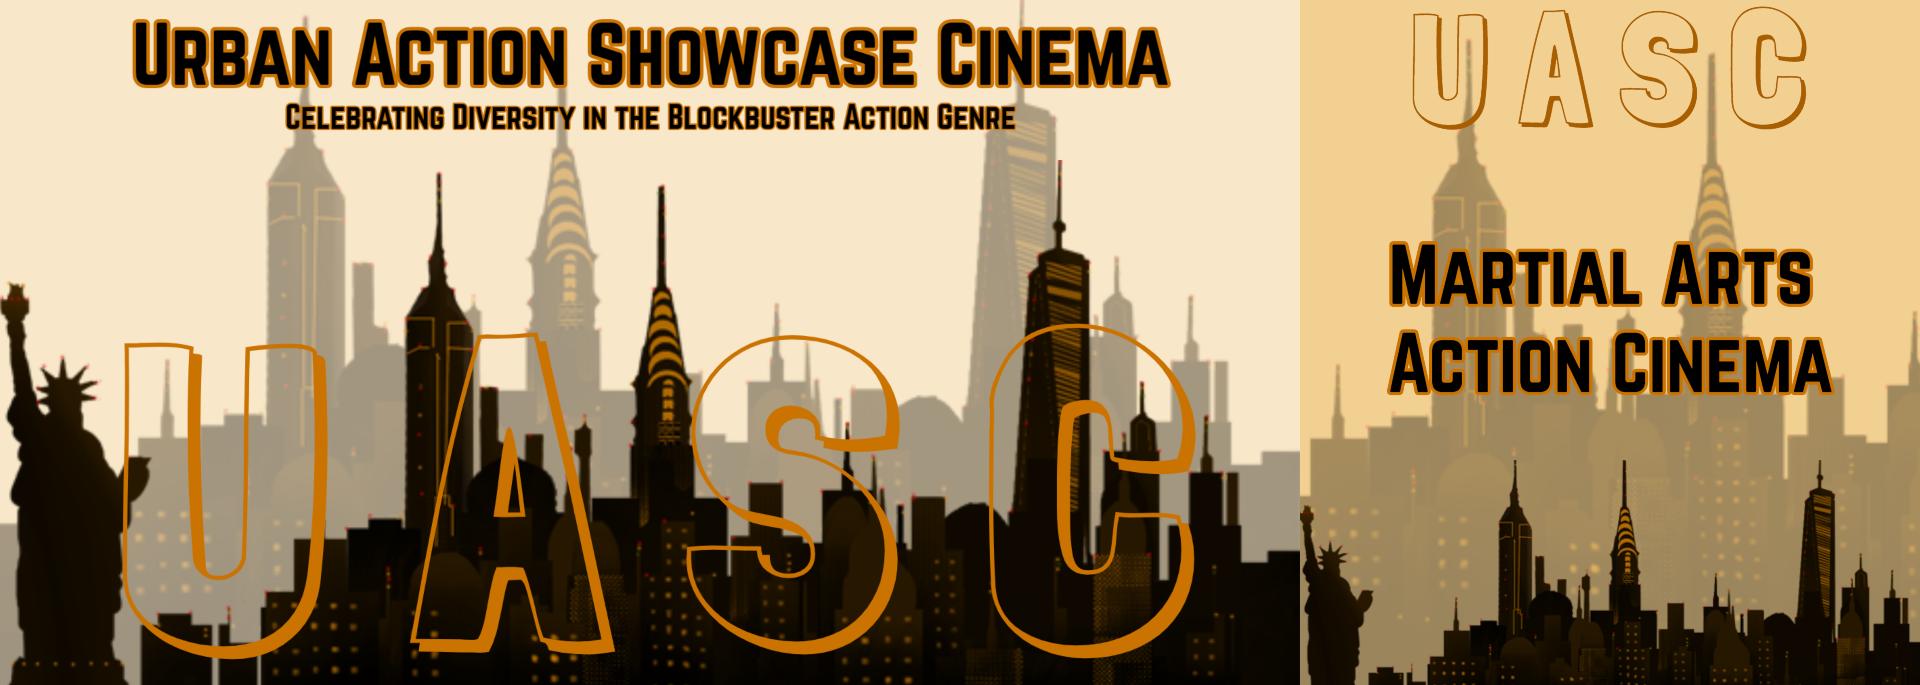 UASC: Martial Arts Action Cinema